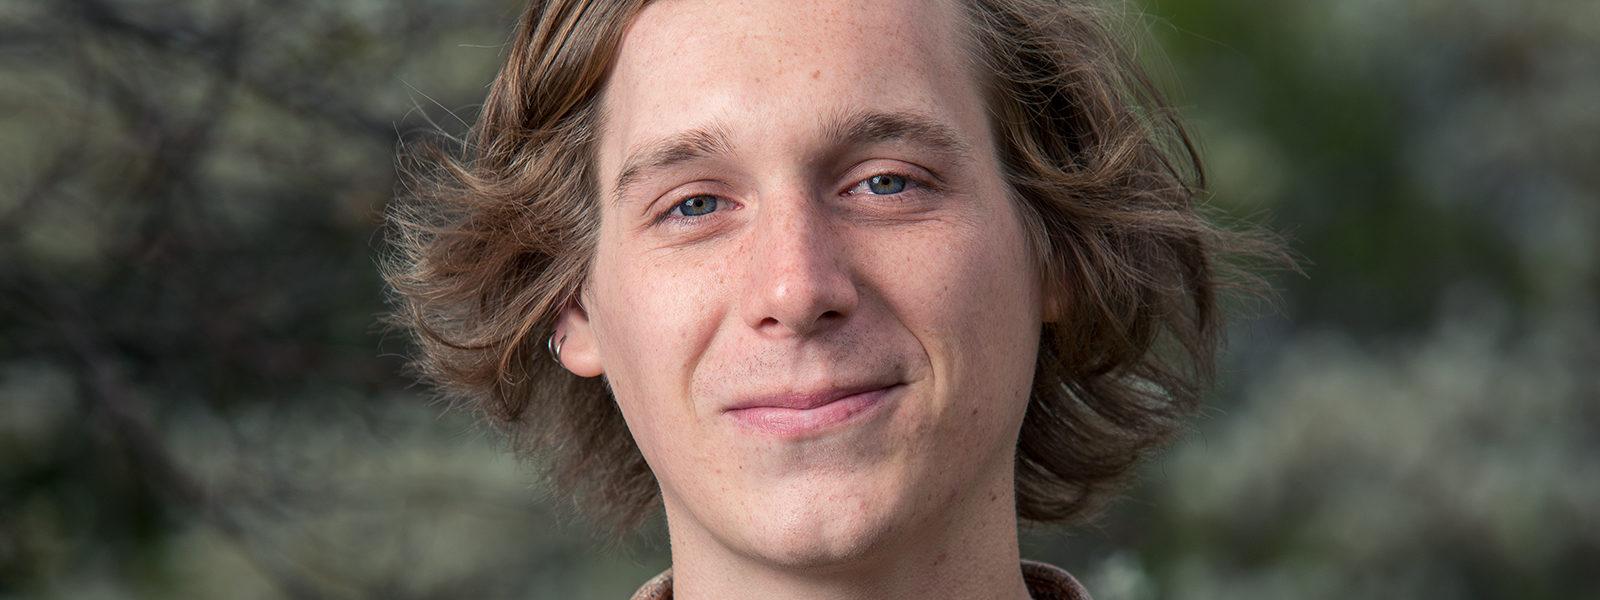 Northland Collge graduate Anthony Procik